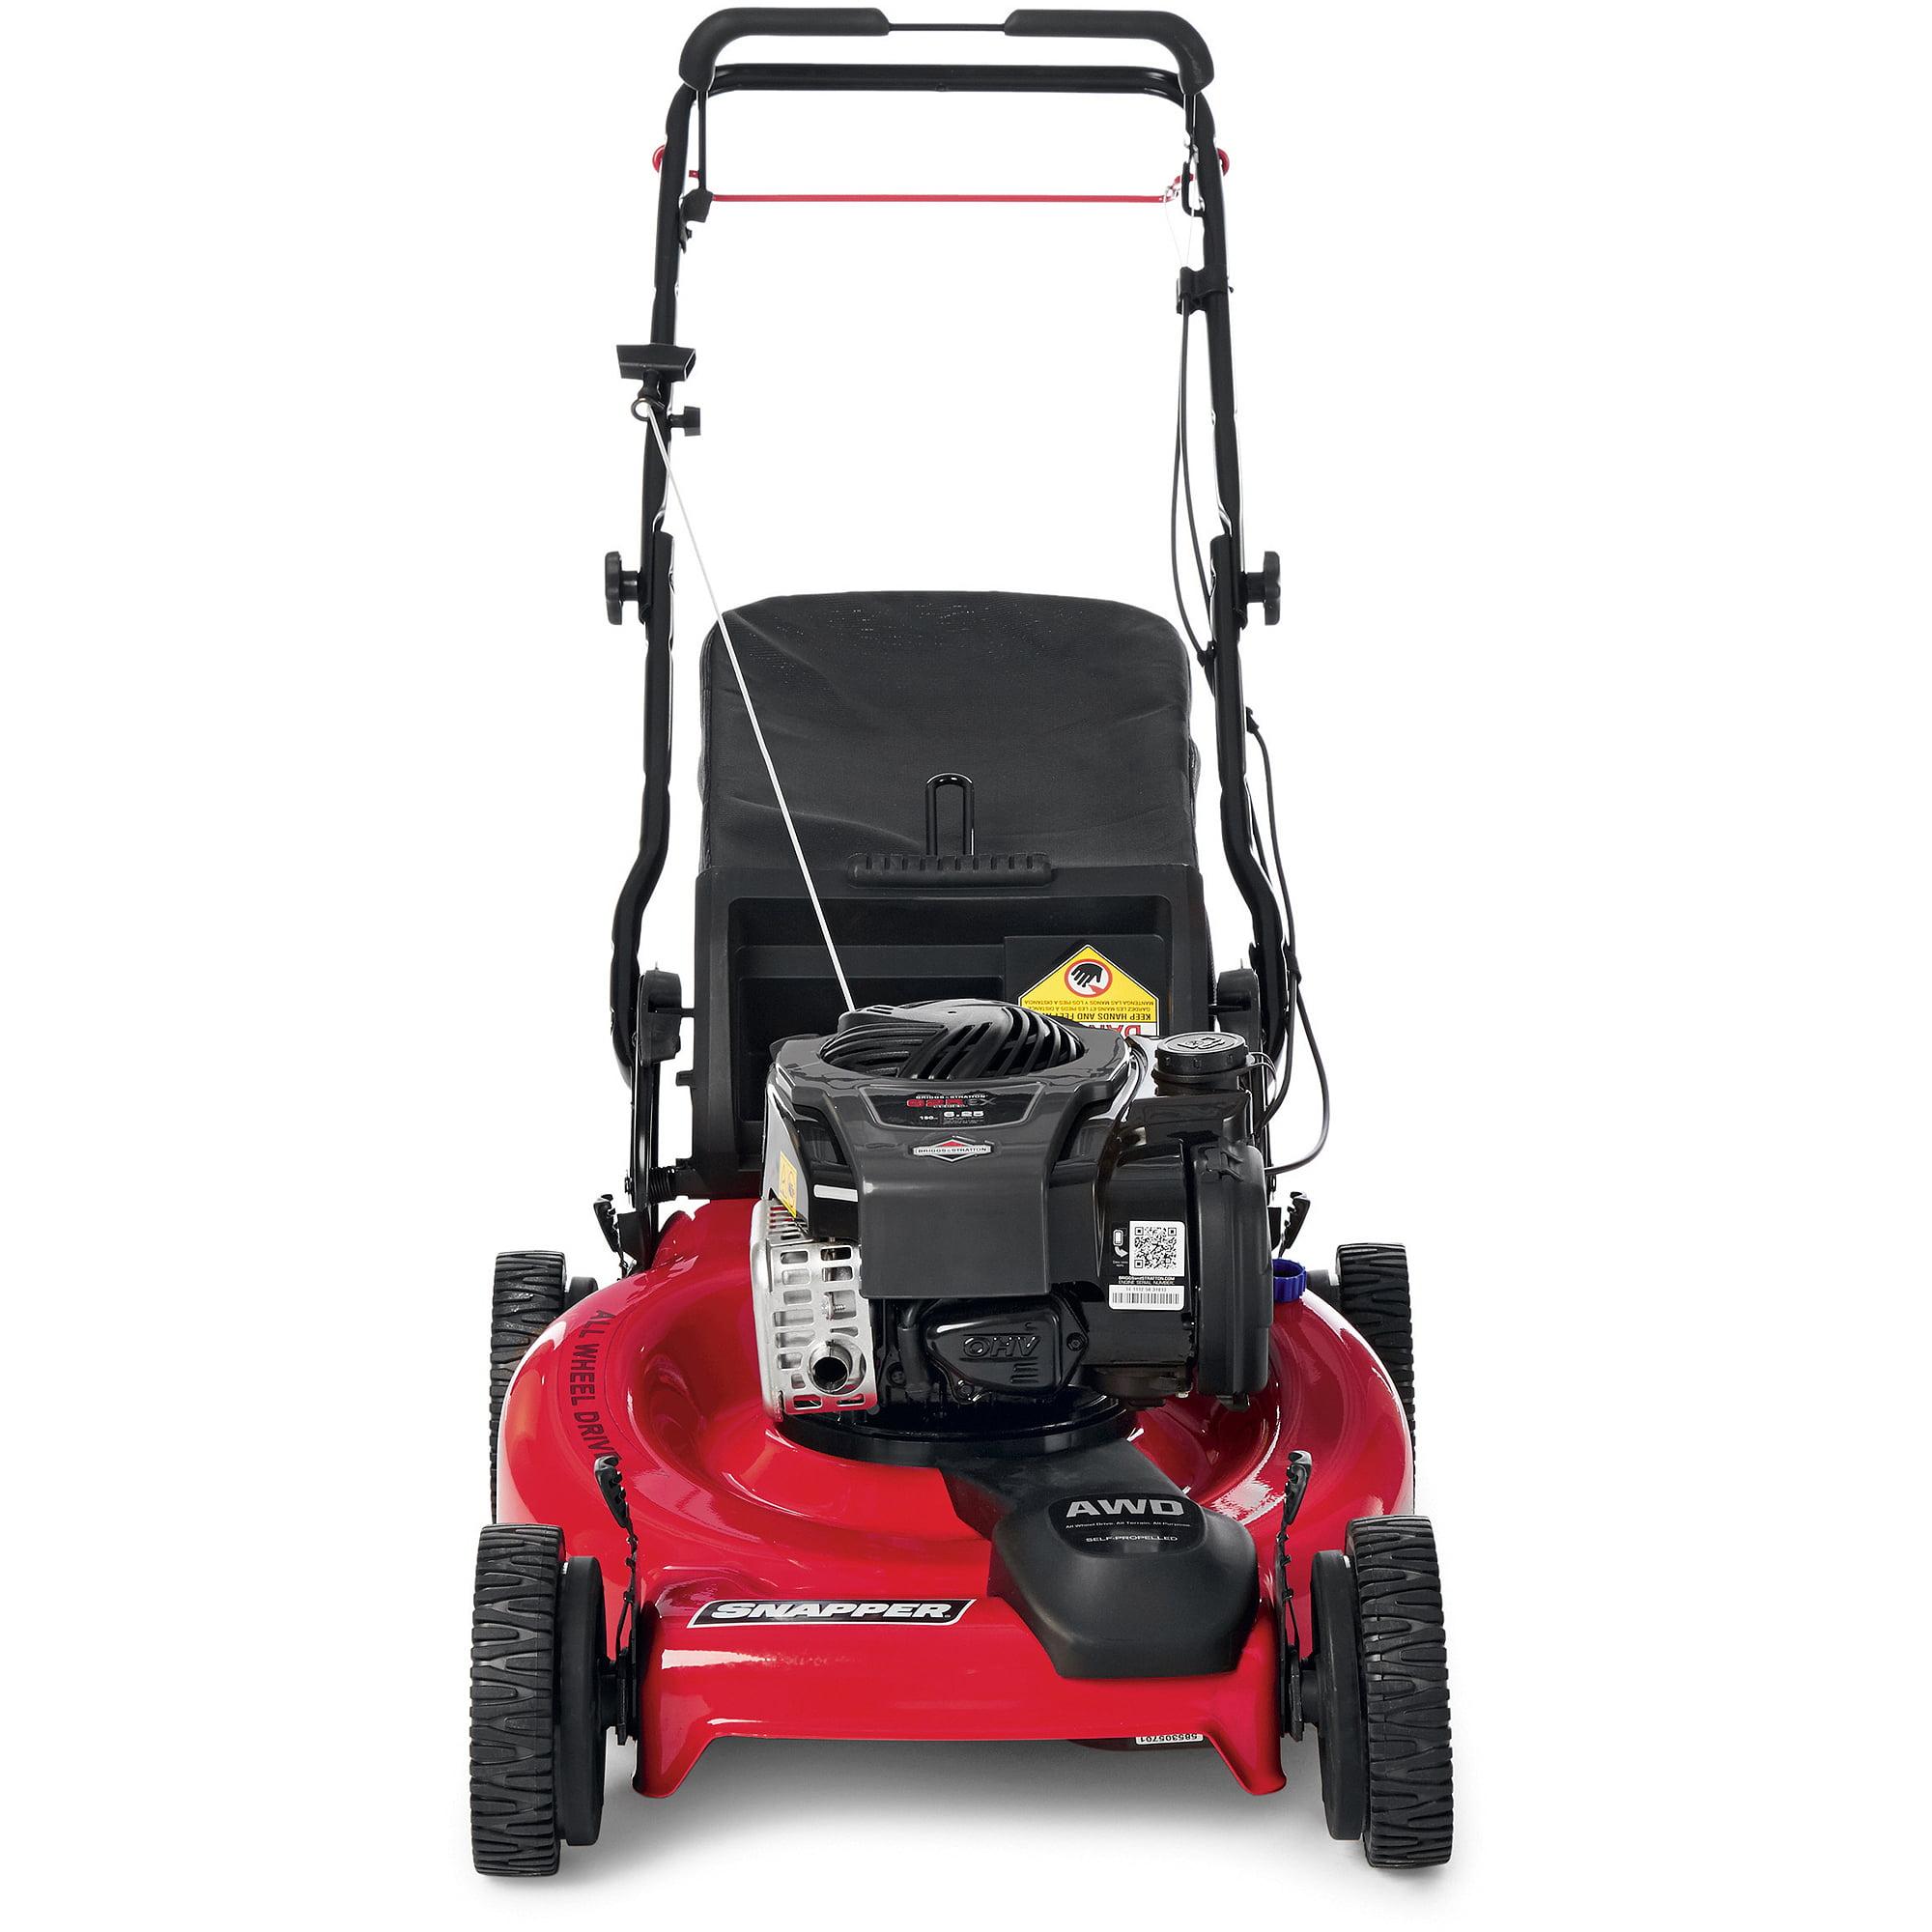 Craftsman Push Lawn Mower Owners Manual Satu Sticker Electric 3 In 1 Electrical Schematics Model 900370510 190cc Owner